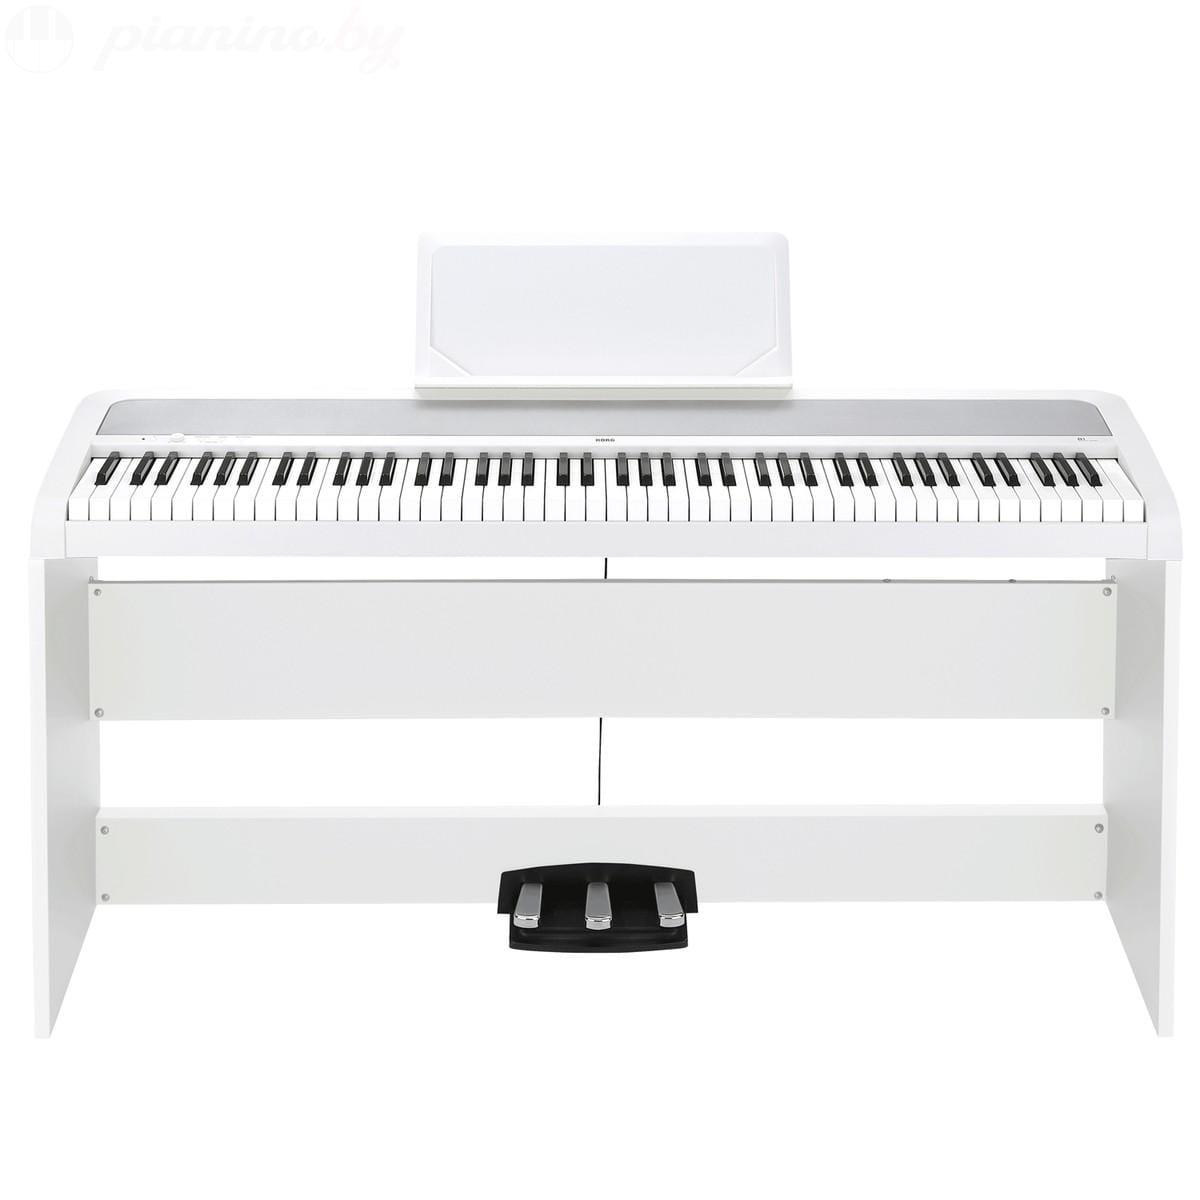 Цифровое пианино Korg B1SP-WH Фото 2